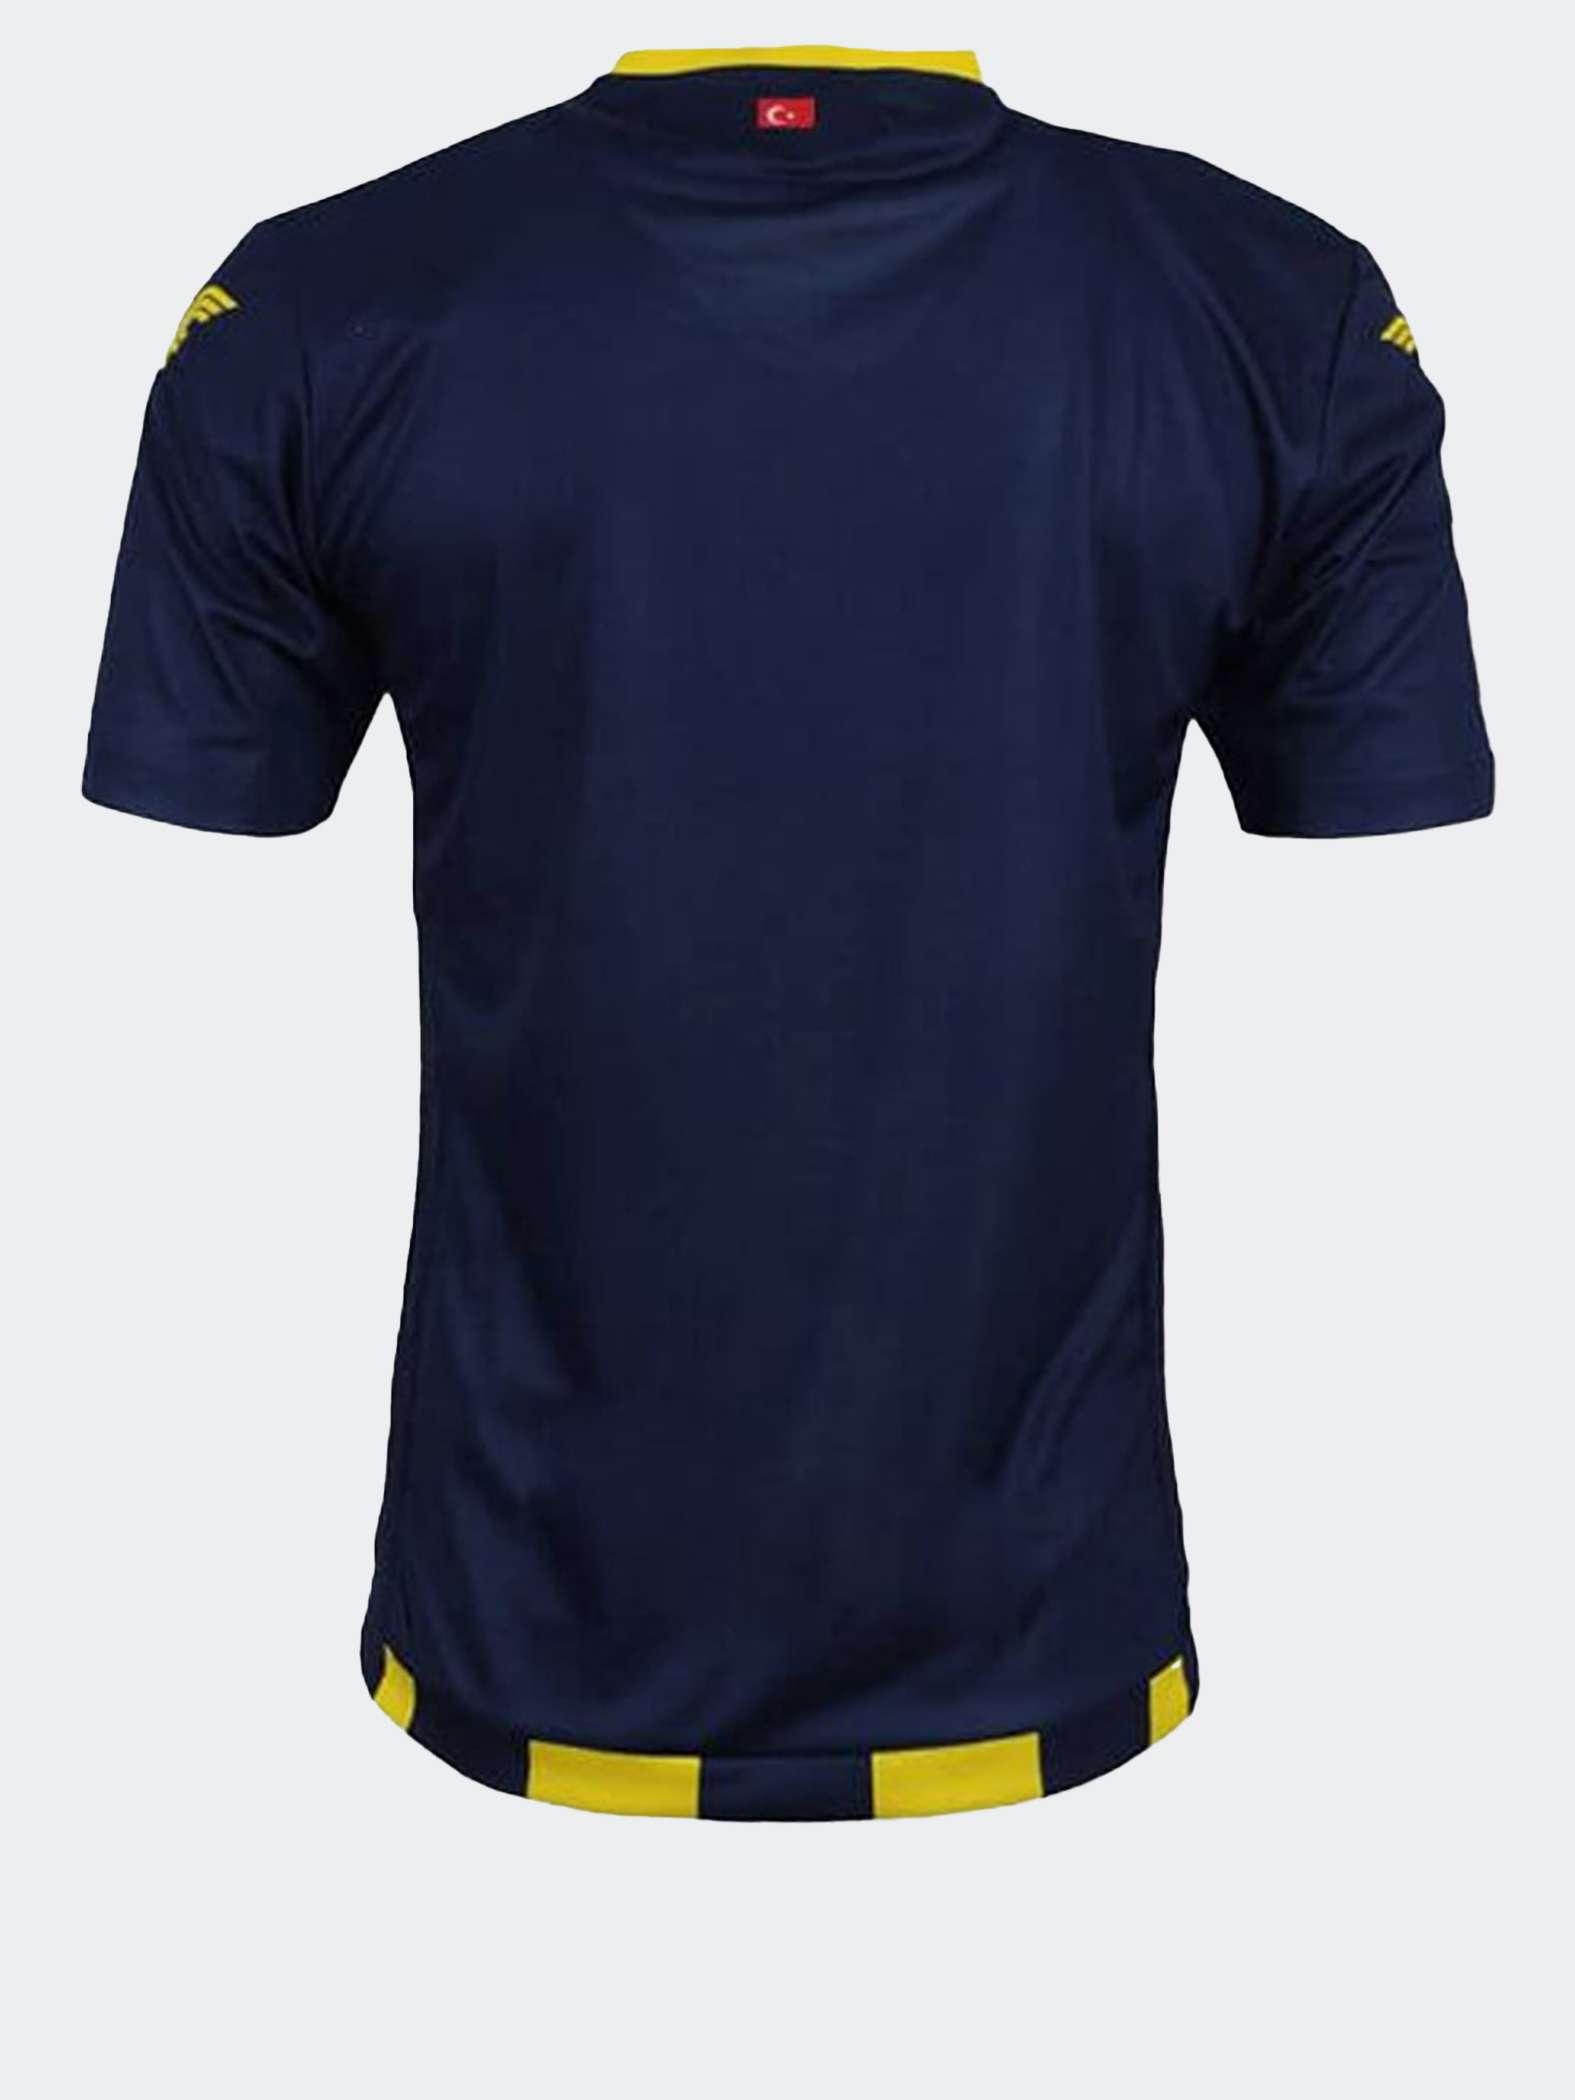 Erkek Çubuklu Fenerbahçe Voleybol Maç Forması